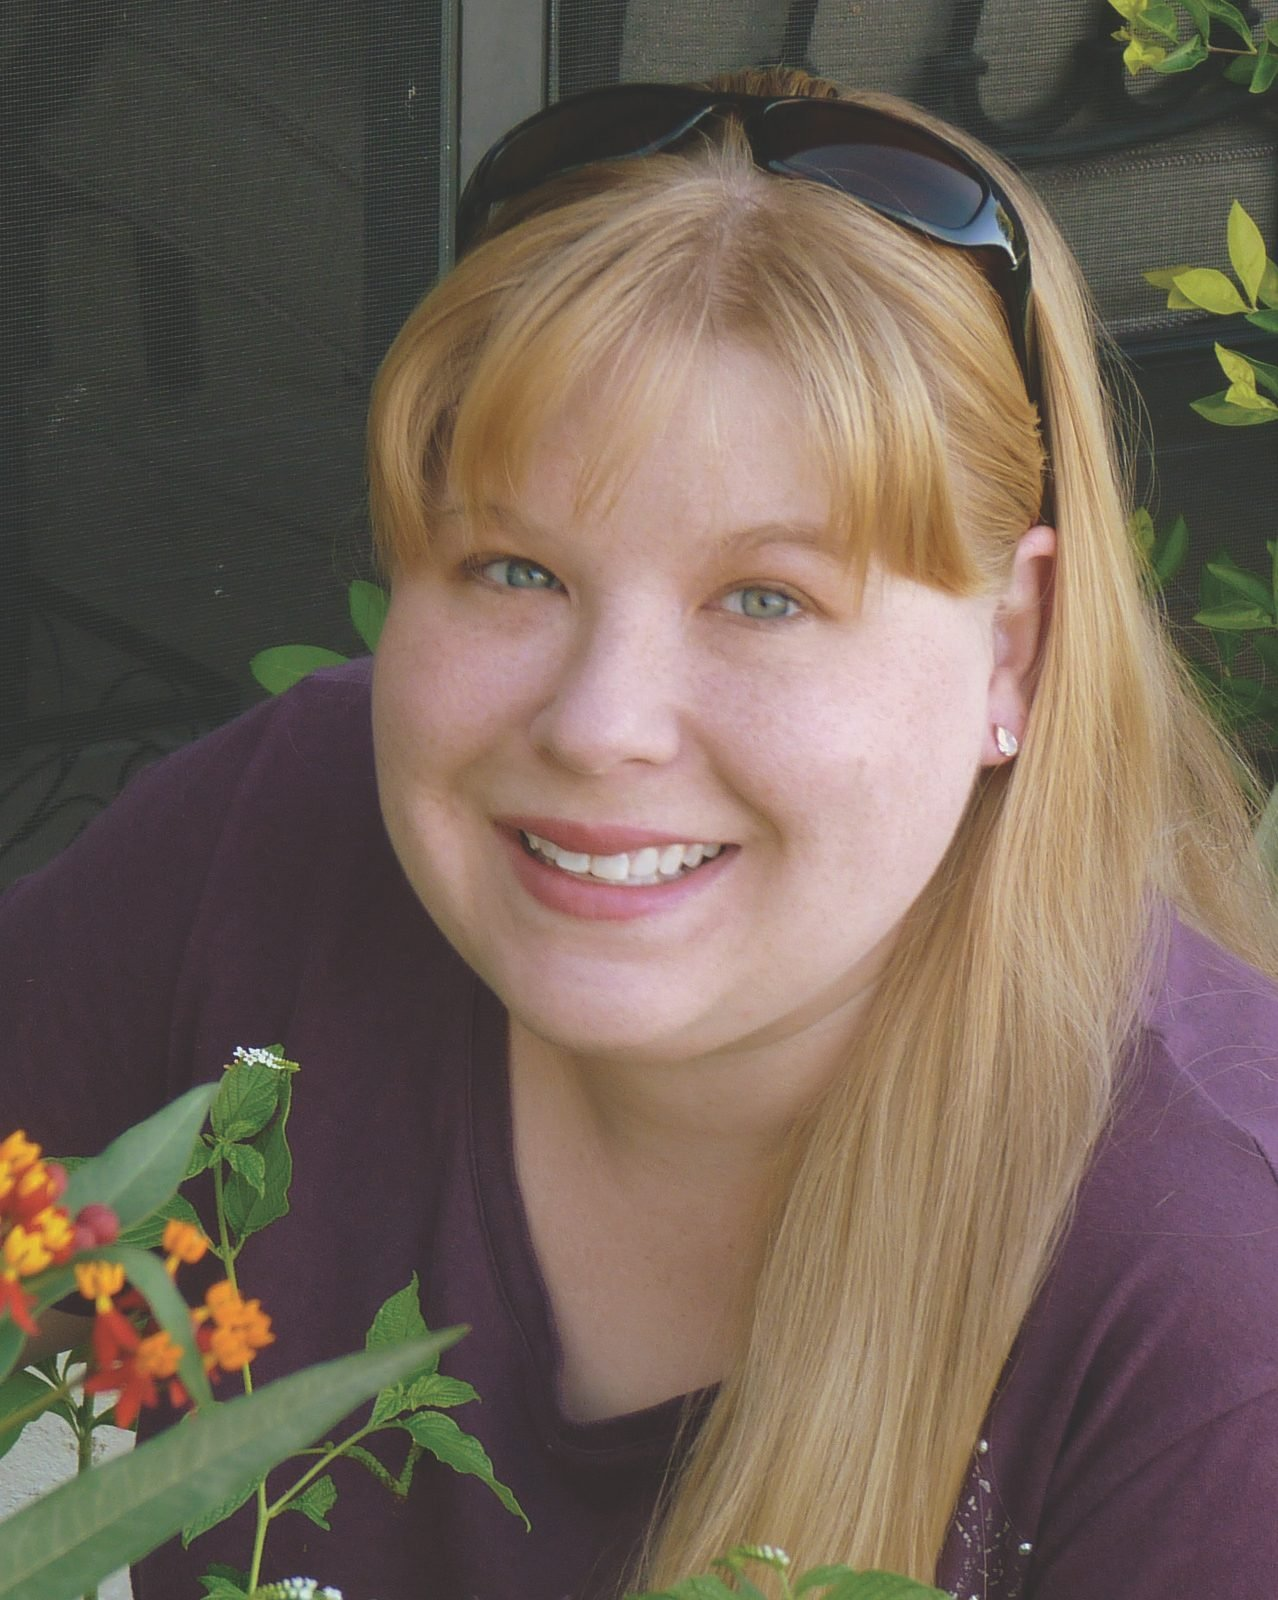 Jill Staake